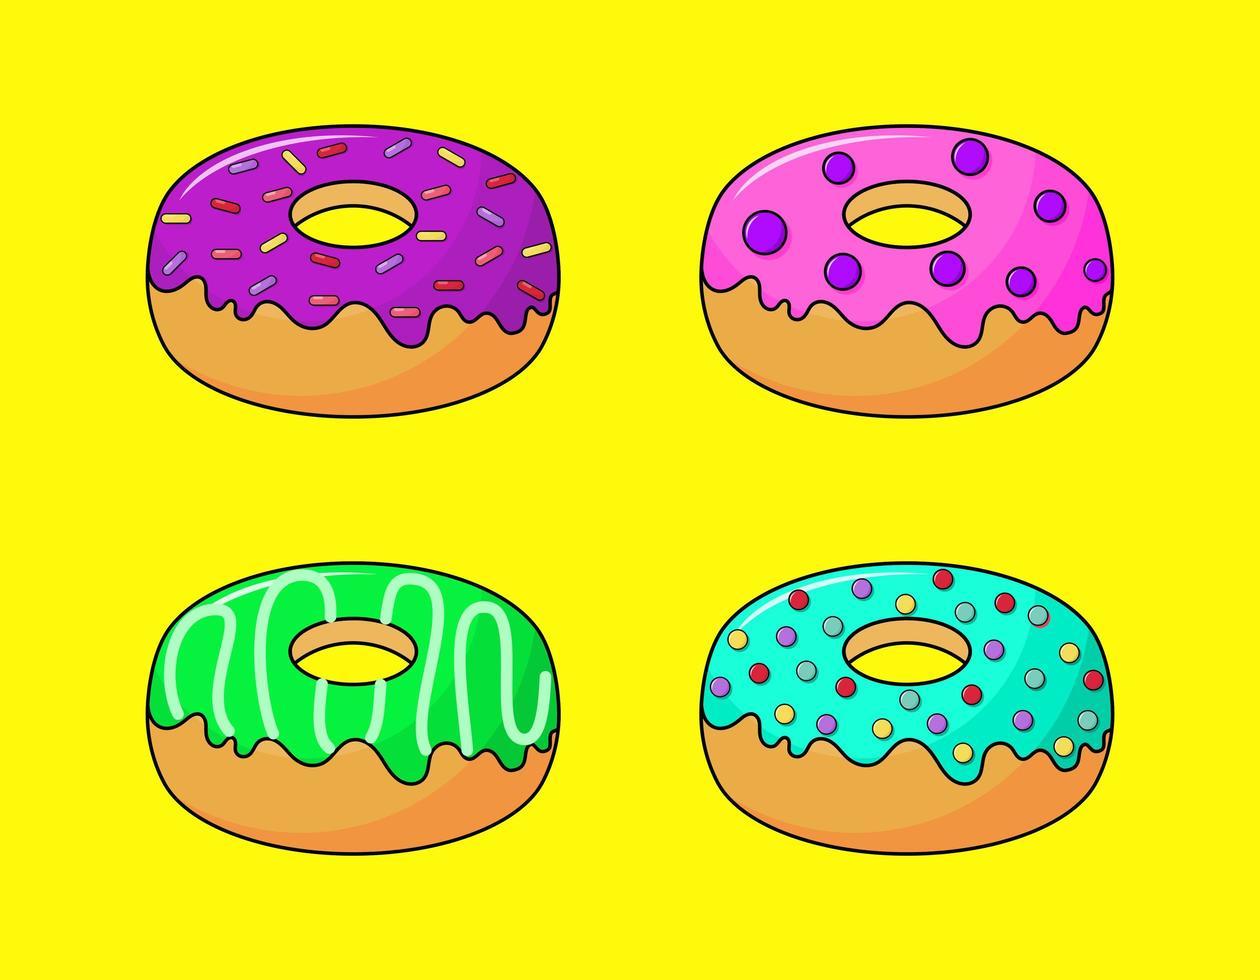 kawaii ciambelle pastello dolci dolci estivi cartoon con diversi tipi vettore